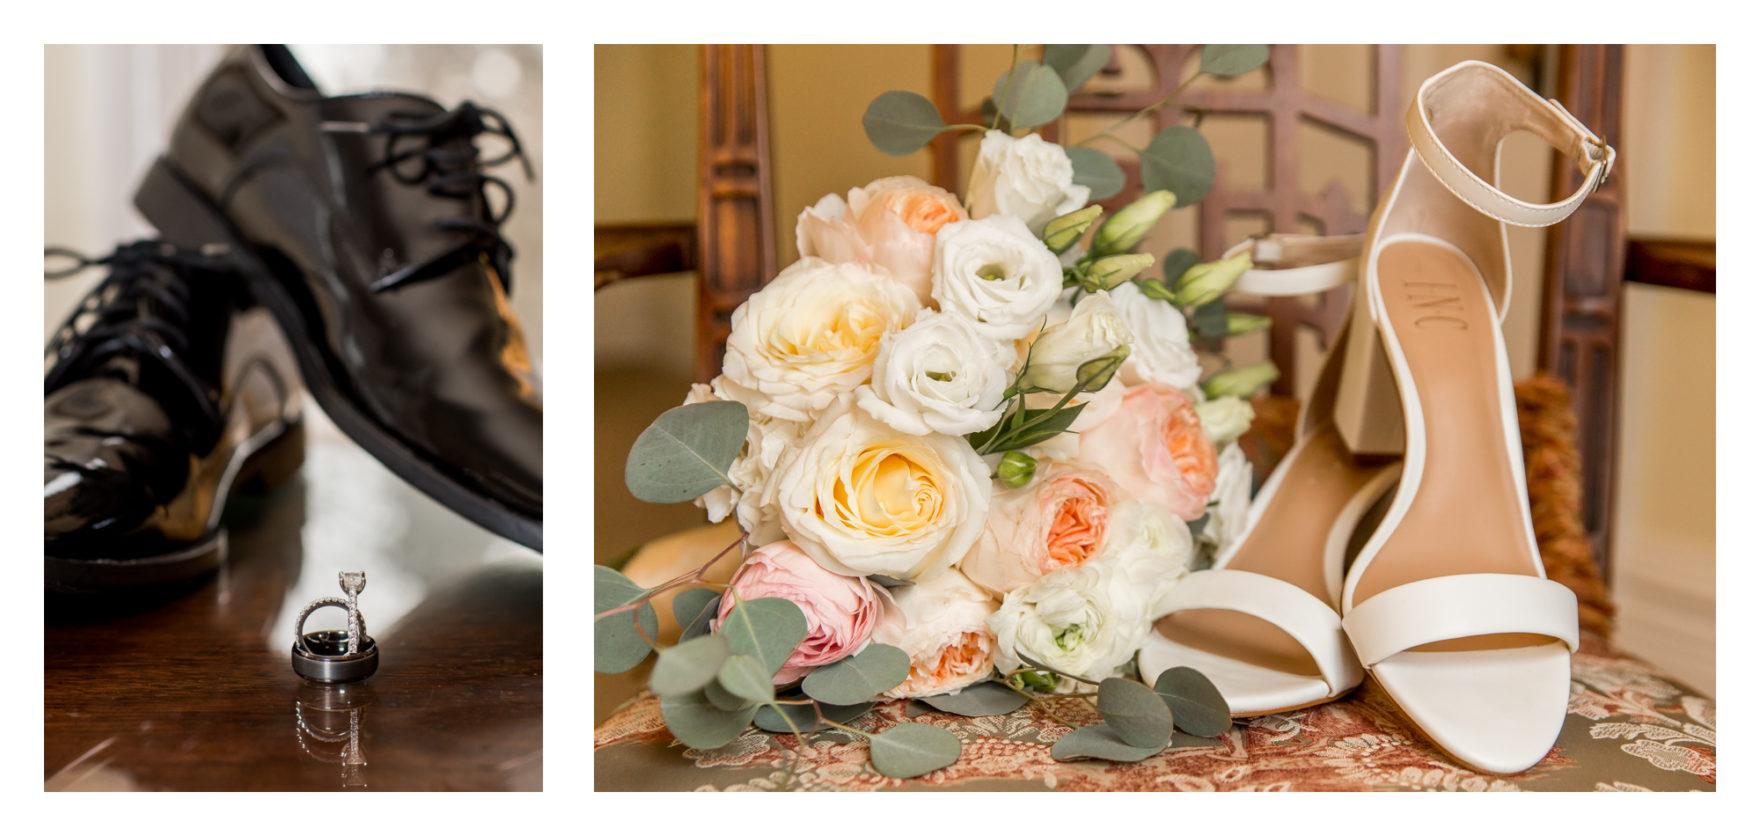 Cold Rainy Fall Wedding Day. Frederick Maryland Wedding Photographer. Frederick Weddings. Ceresville Mansion. Dreary Wedding Day